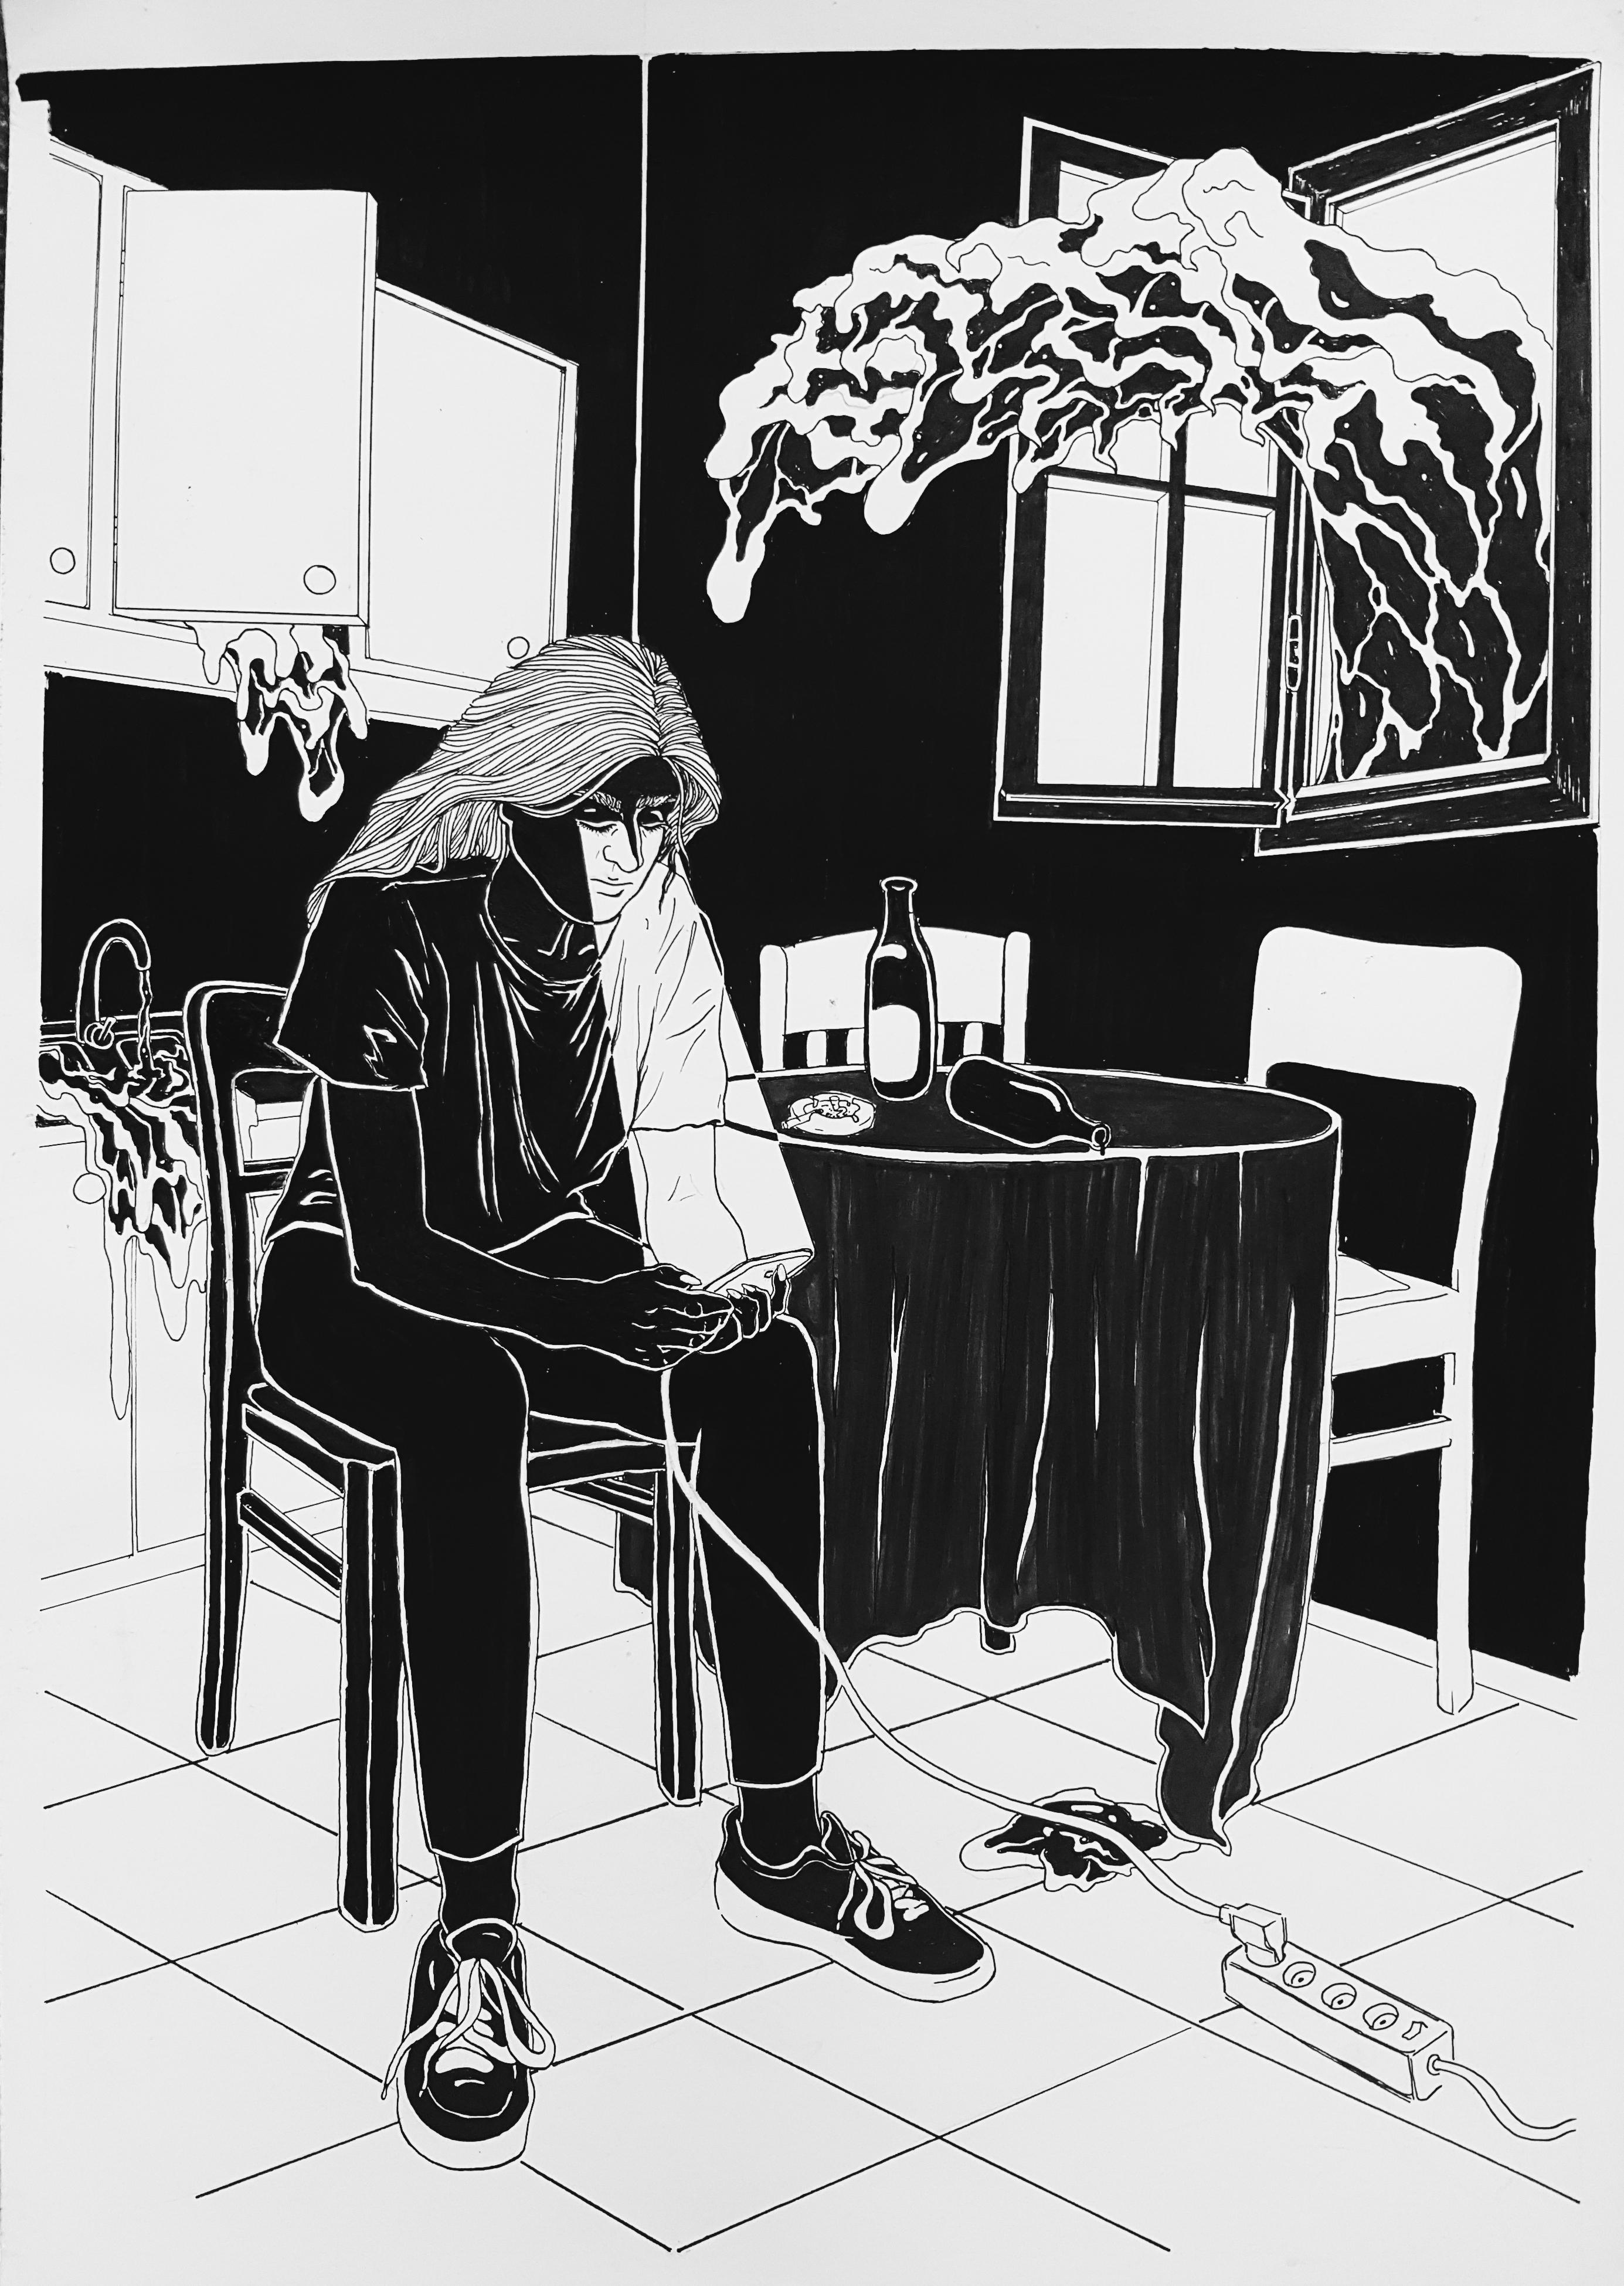 Melancholic future